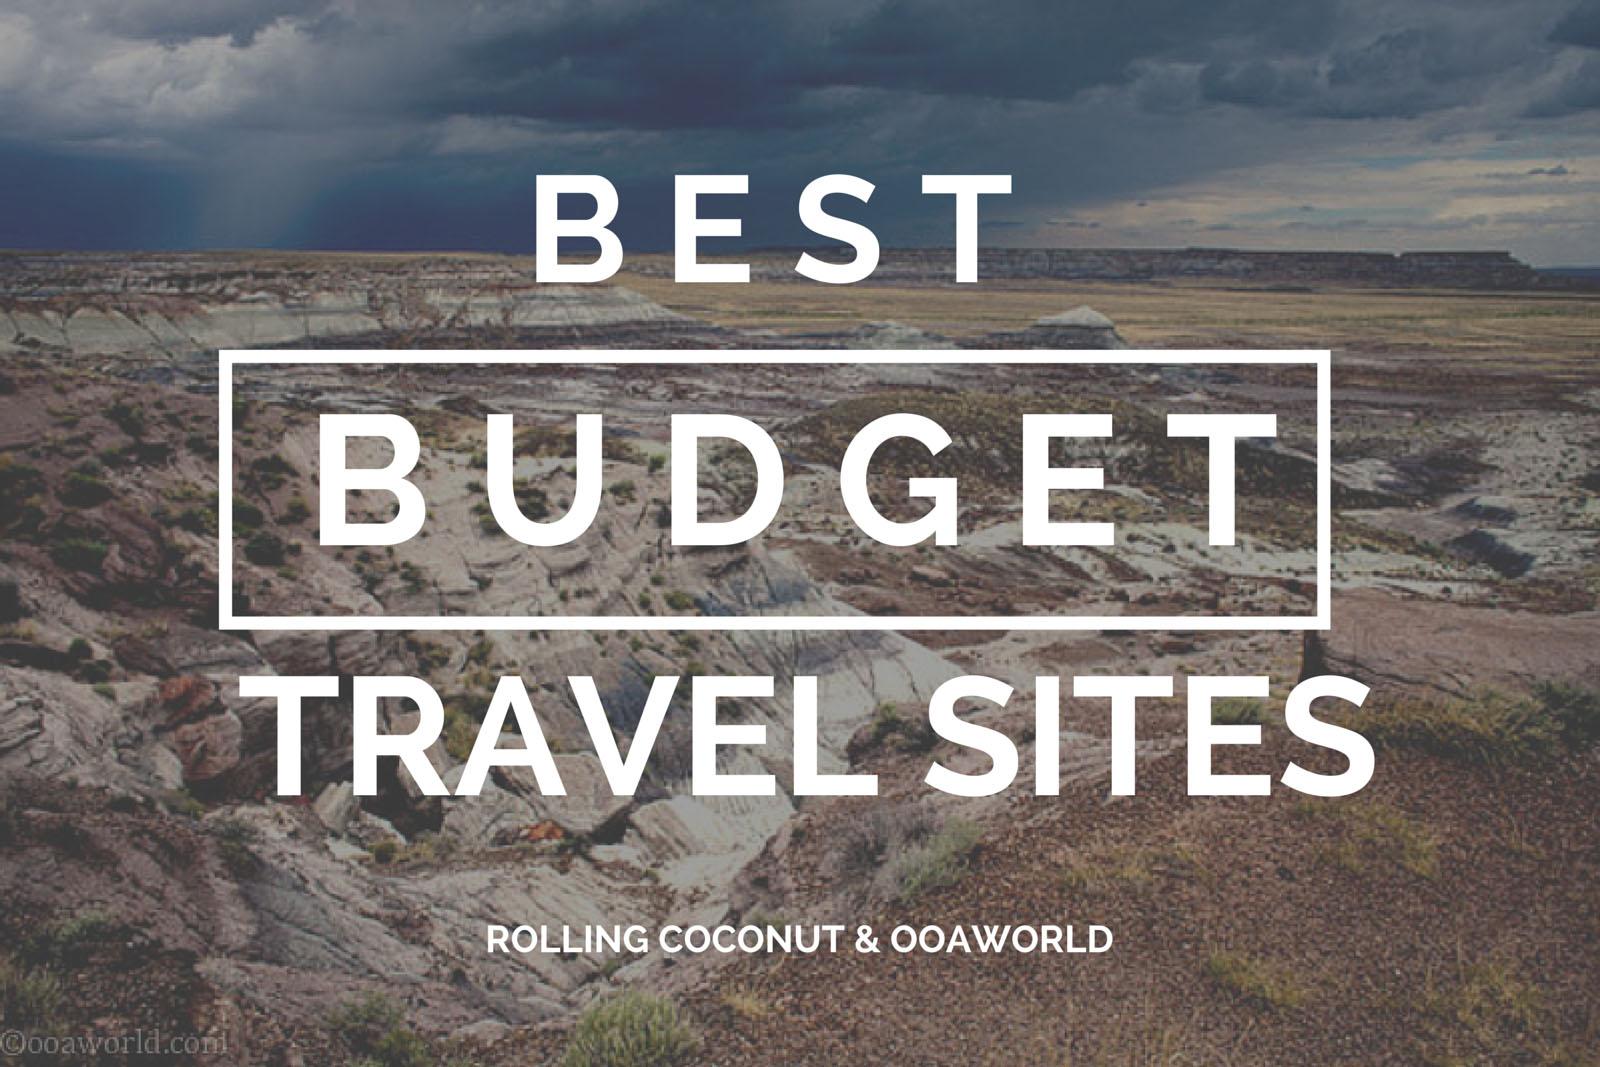 Best Budget Travel Sites OOAworld Photo Ooaworld